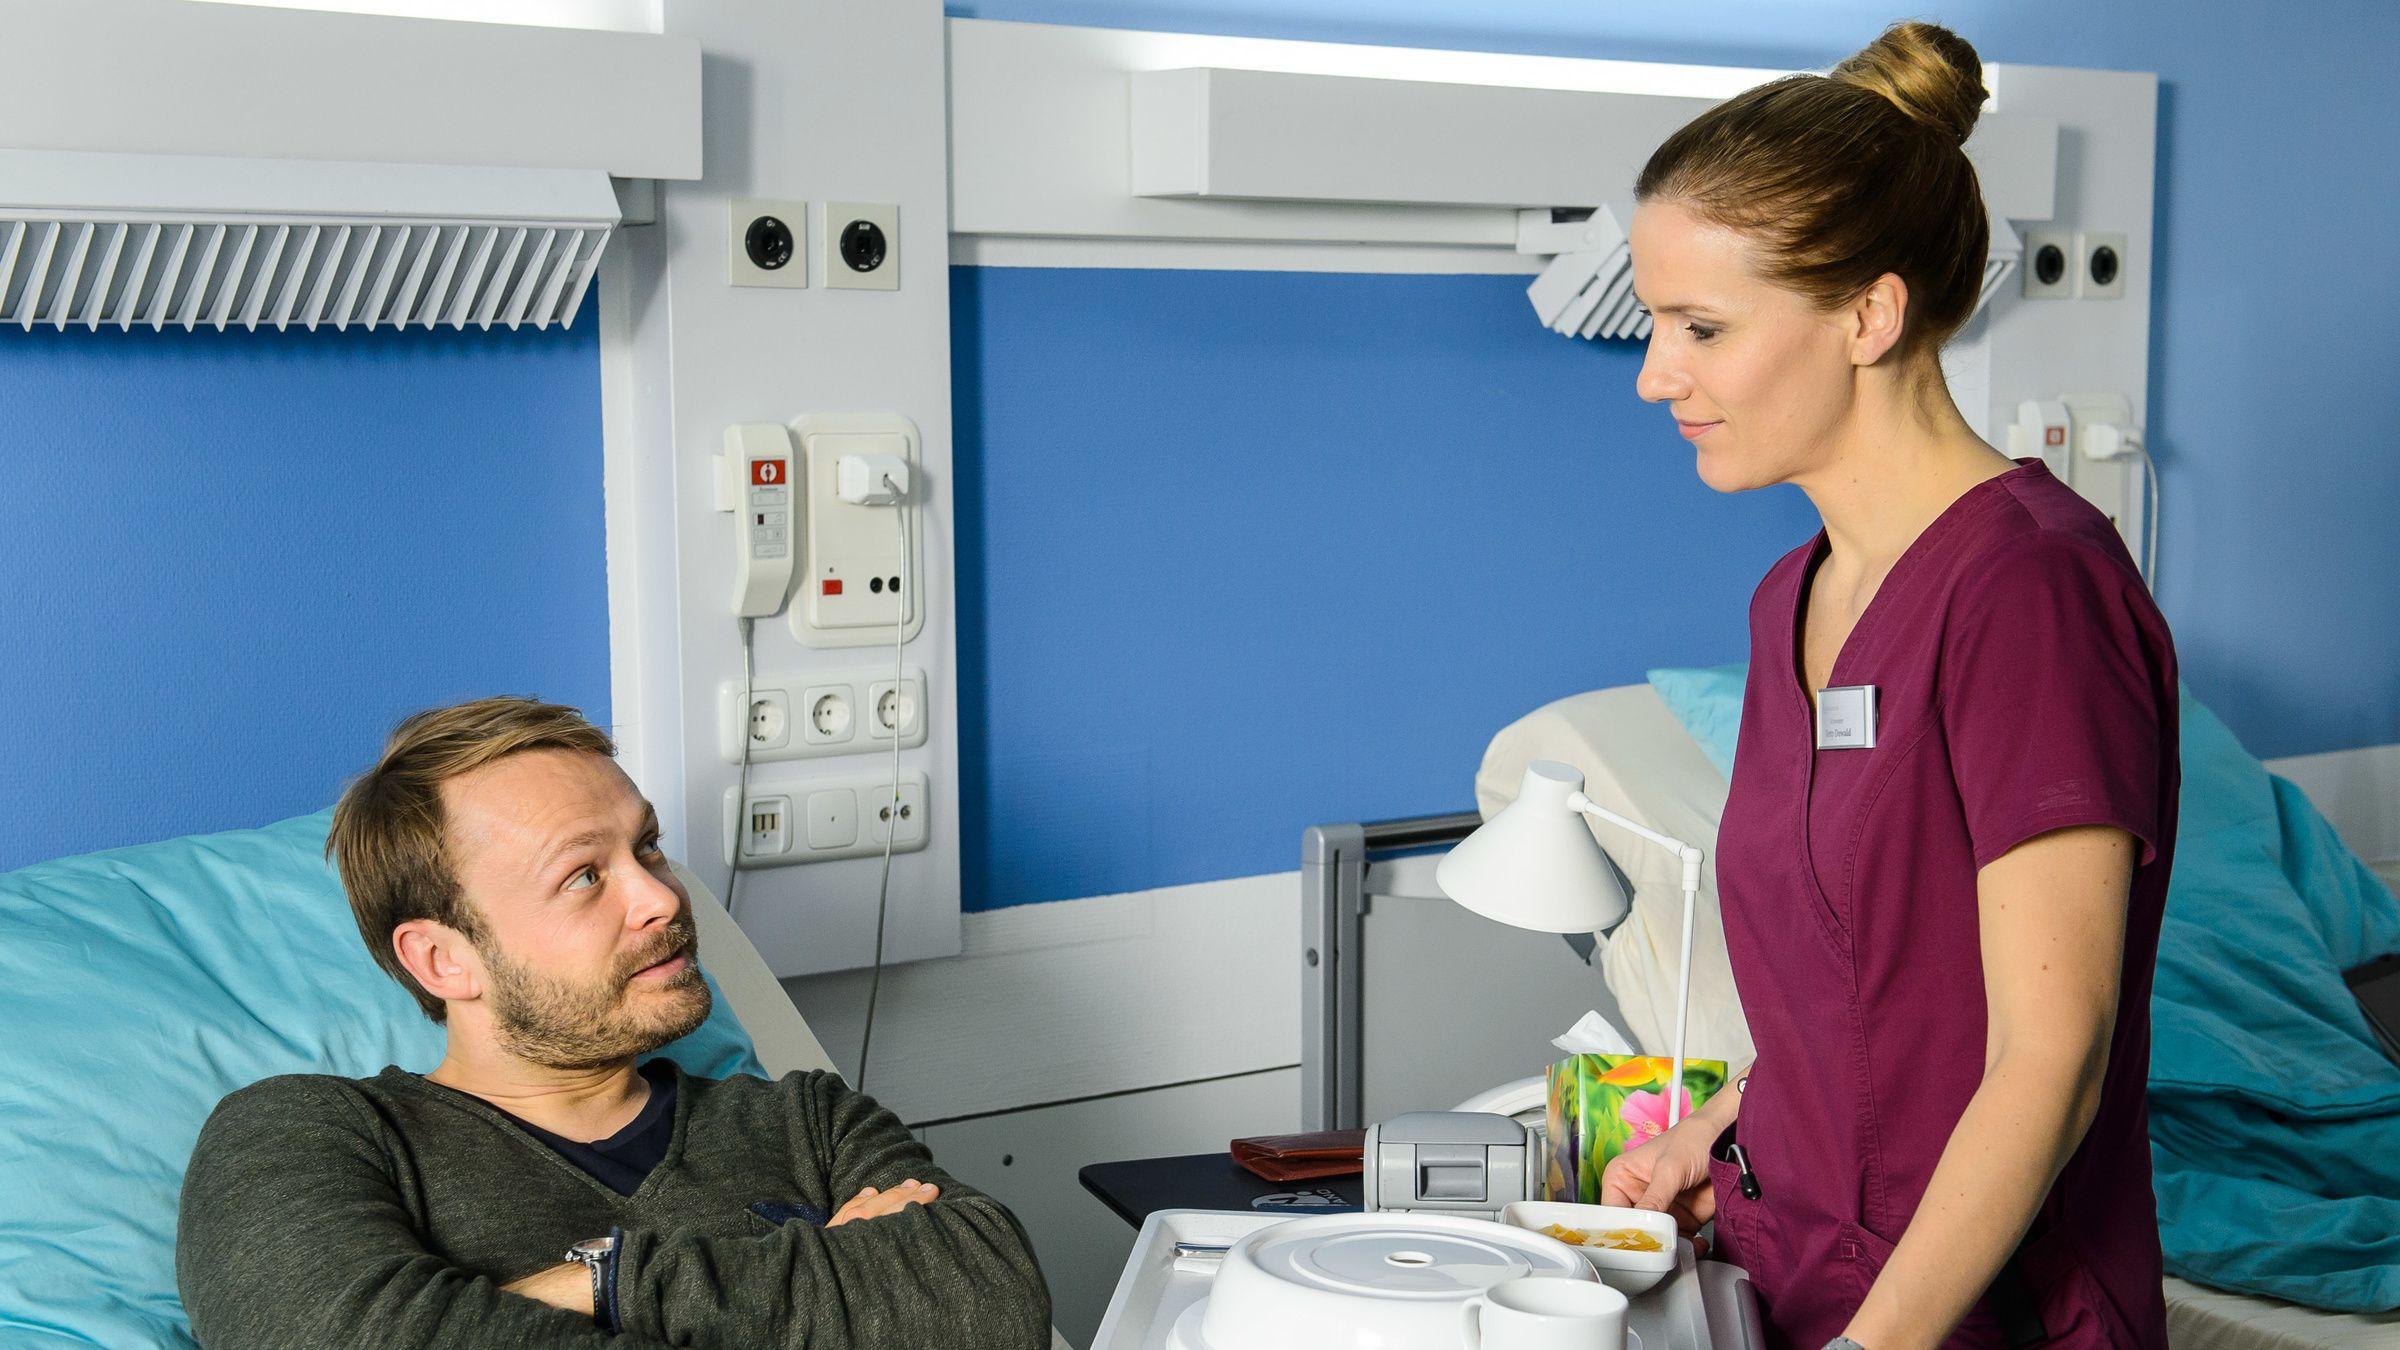 """Bettys Diagnose Undercover Boss"" Patient Schneider"